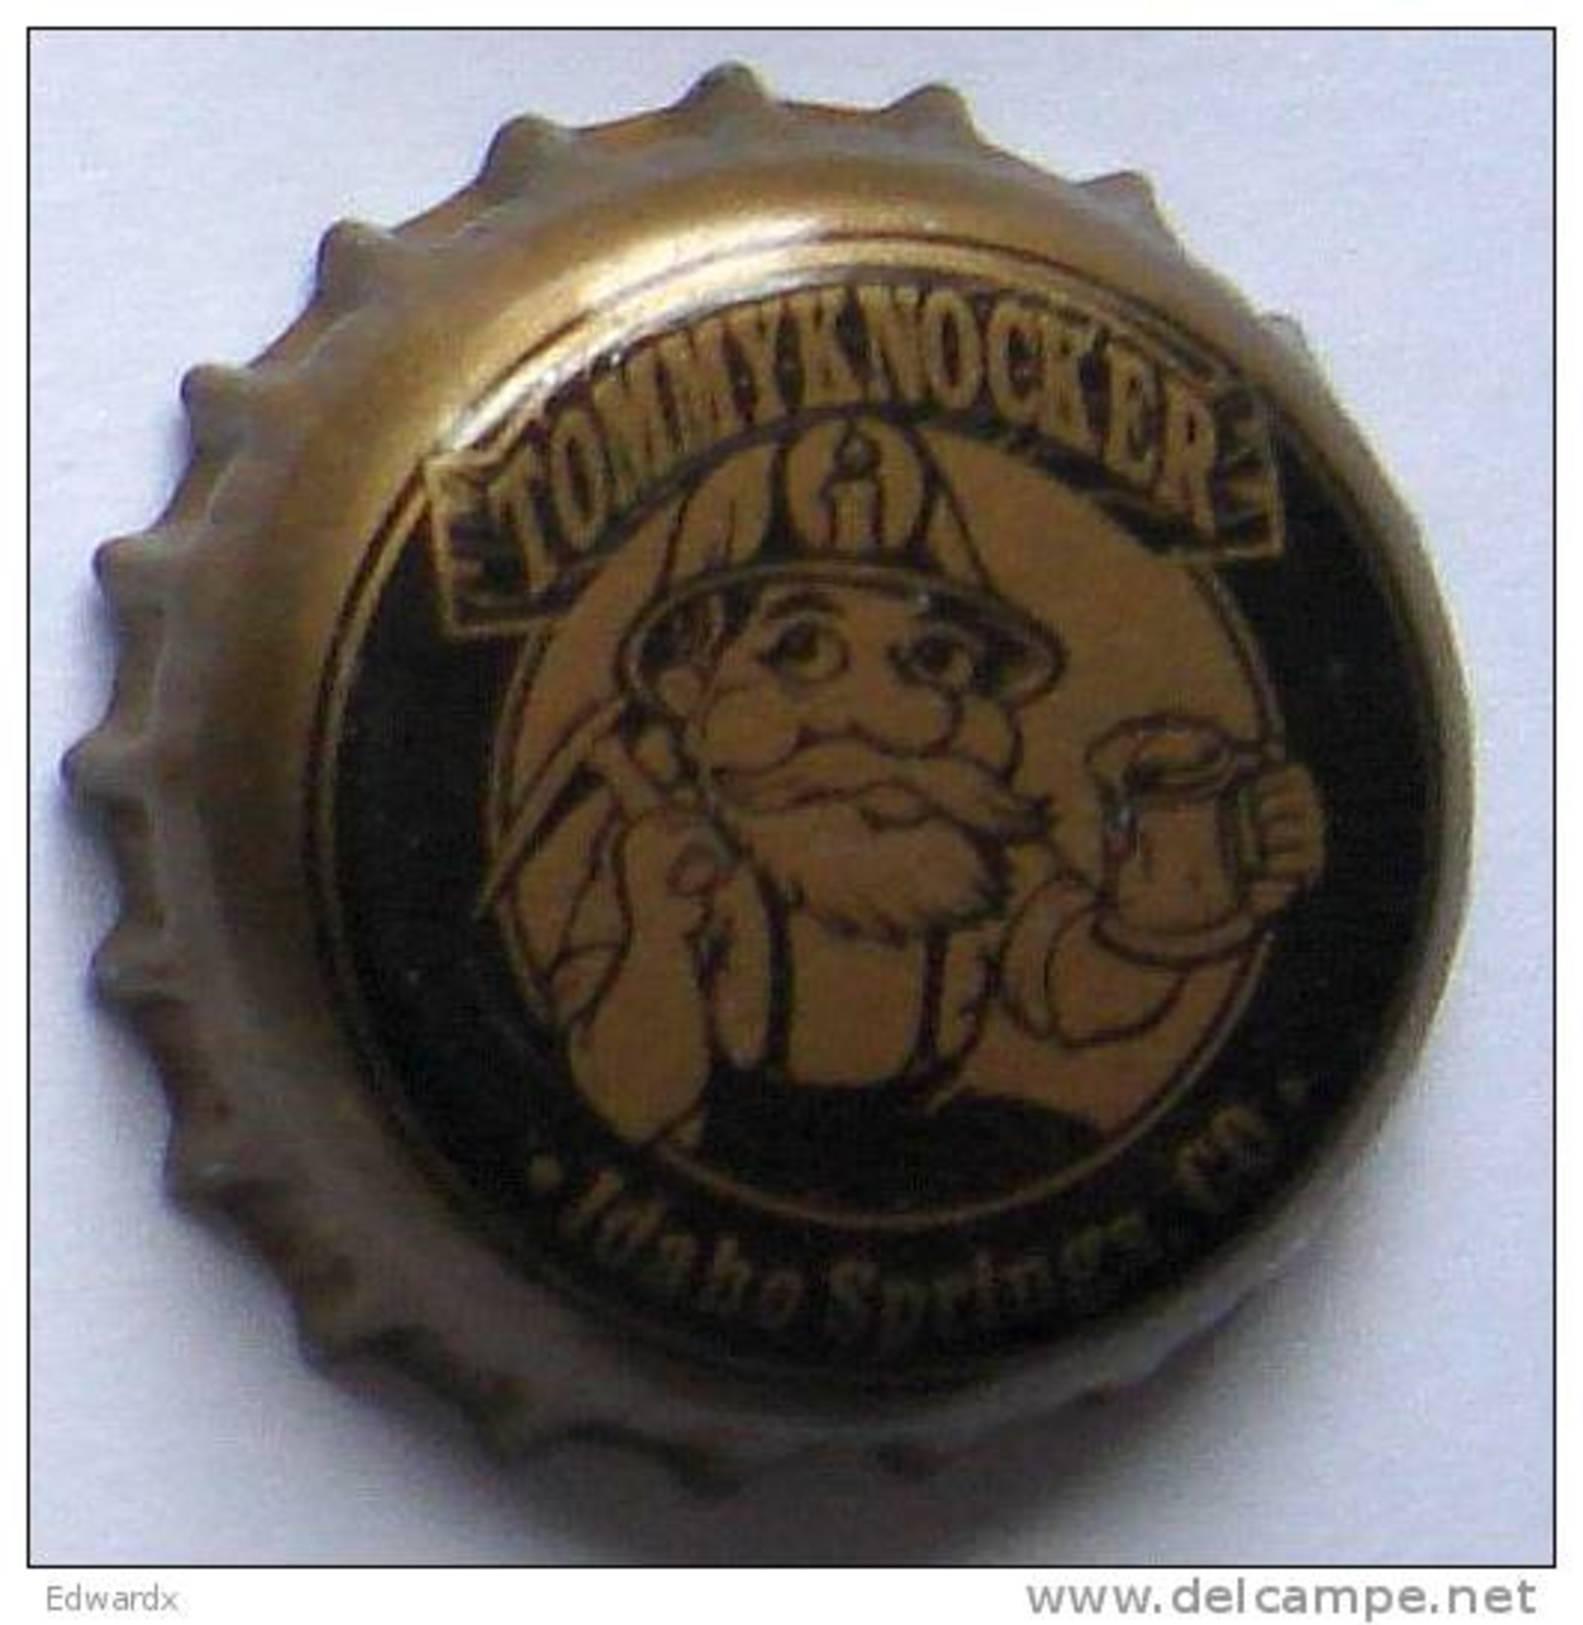 Tommyknocker USA Beer Bottle Top Crown Cap Kronkorken Capsule Tappi Chapa - Beer